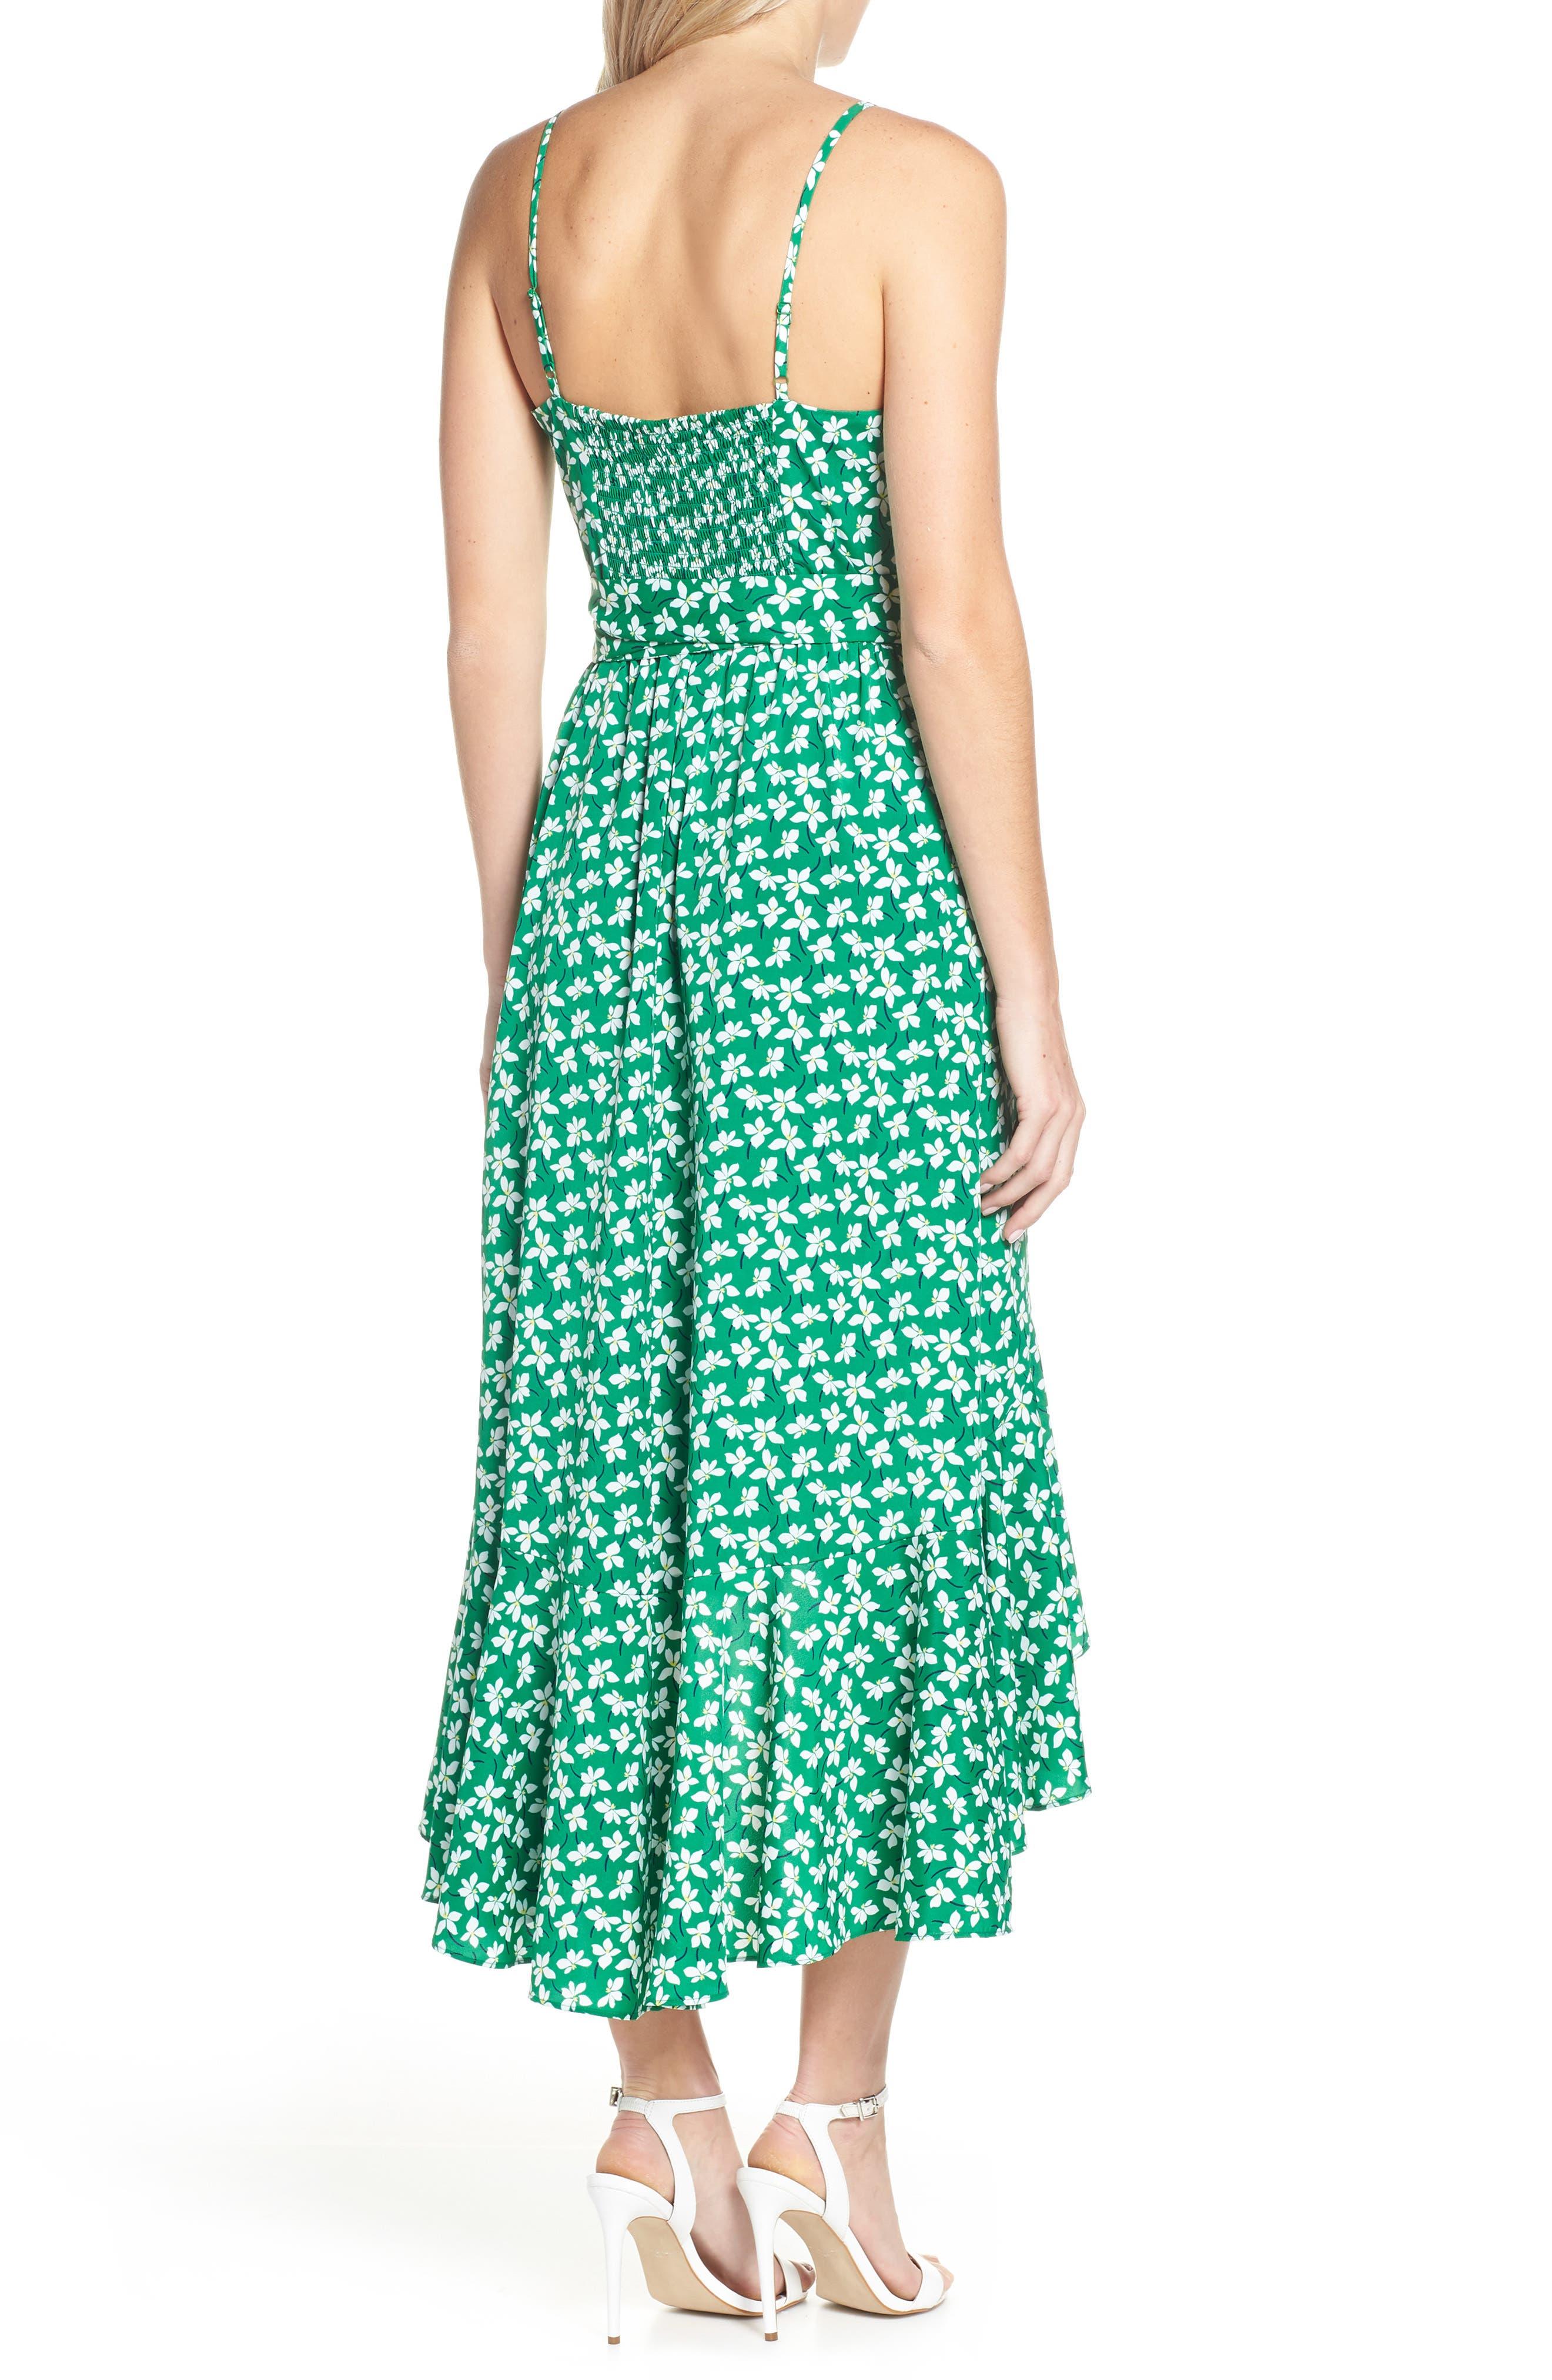 ELIZA J, Floral High/Low Faux Wrap Dress, Alternate thumbnail 2, color, GREEN